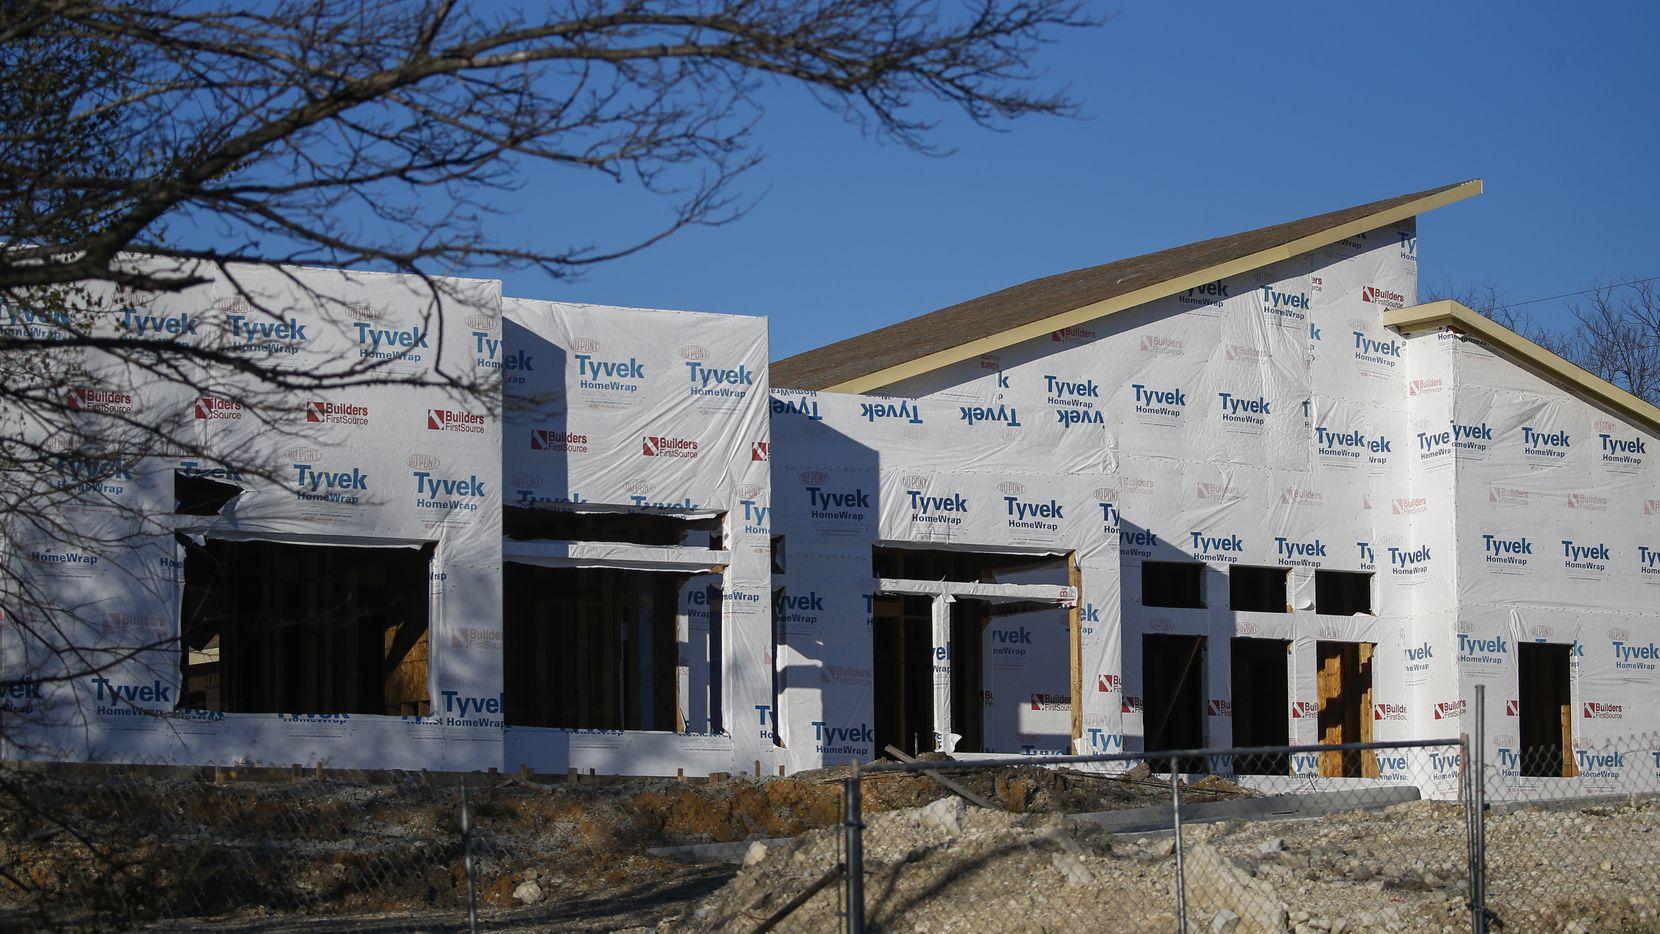 AT LAST! boarding school is seen under construction Wednesday, Feb. 26, 2020 in Dallas.